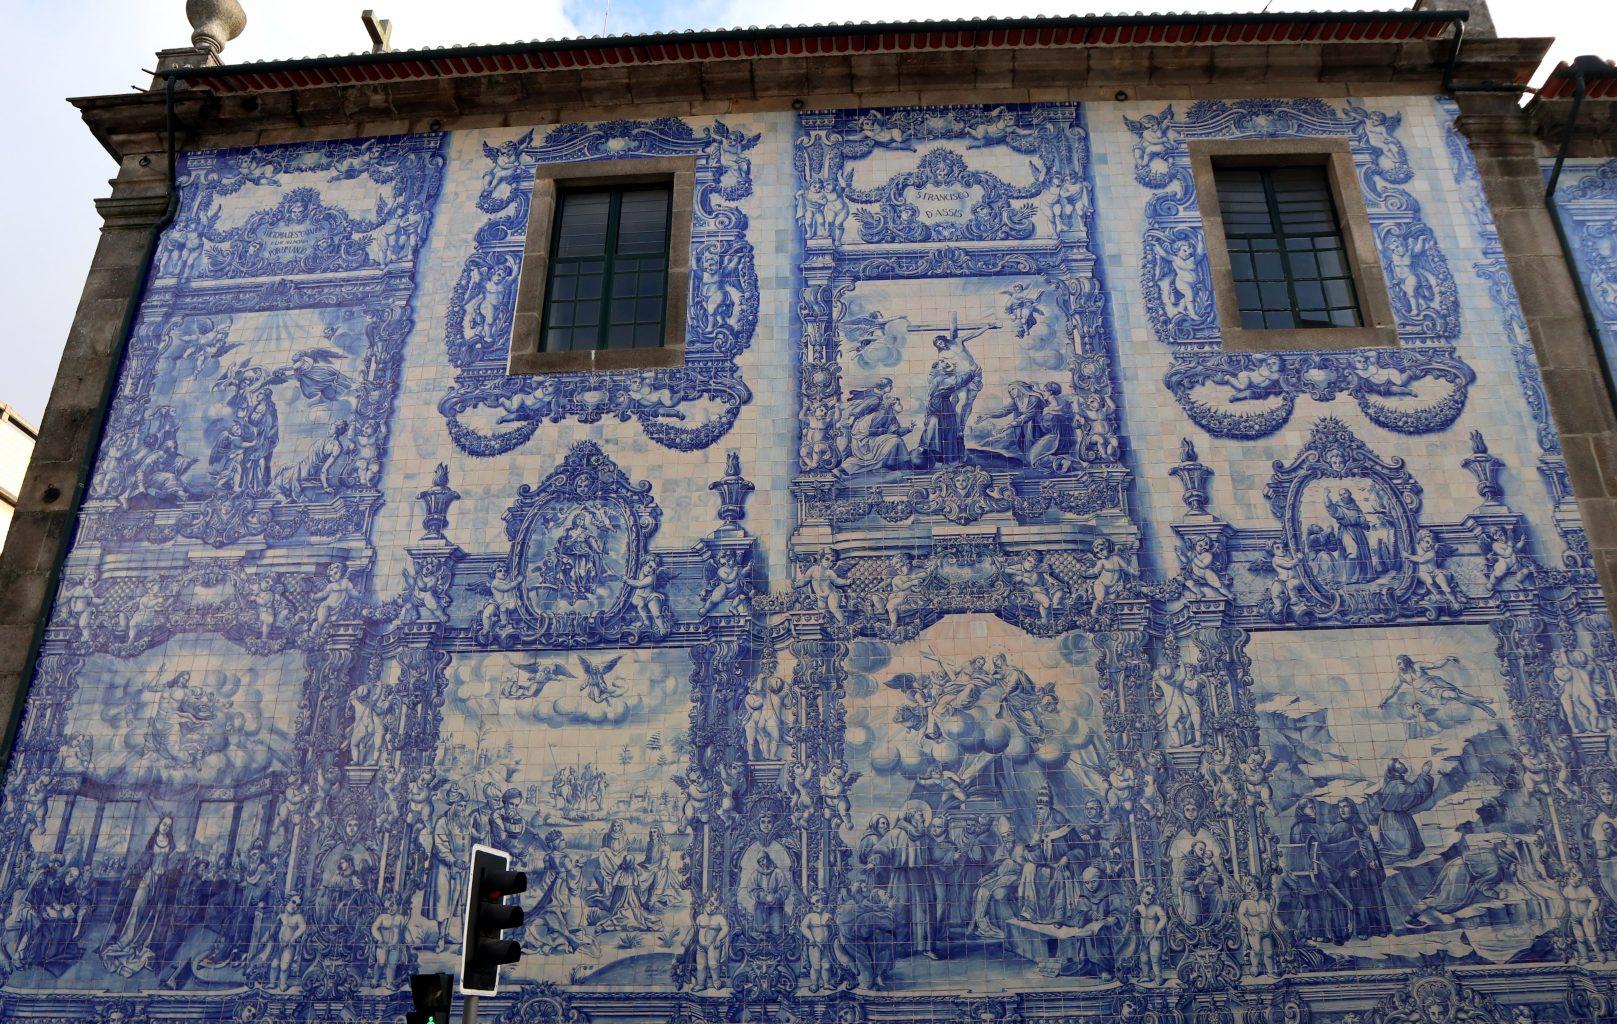 Fachada de la Capela das Almas. Oporto